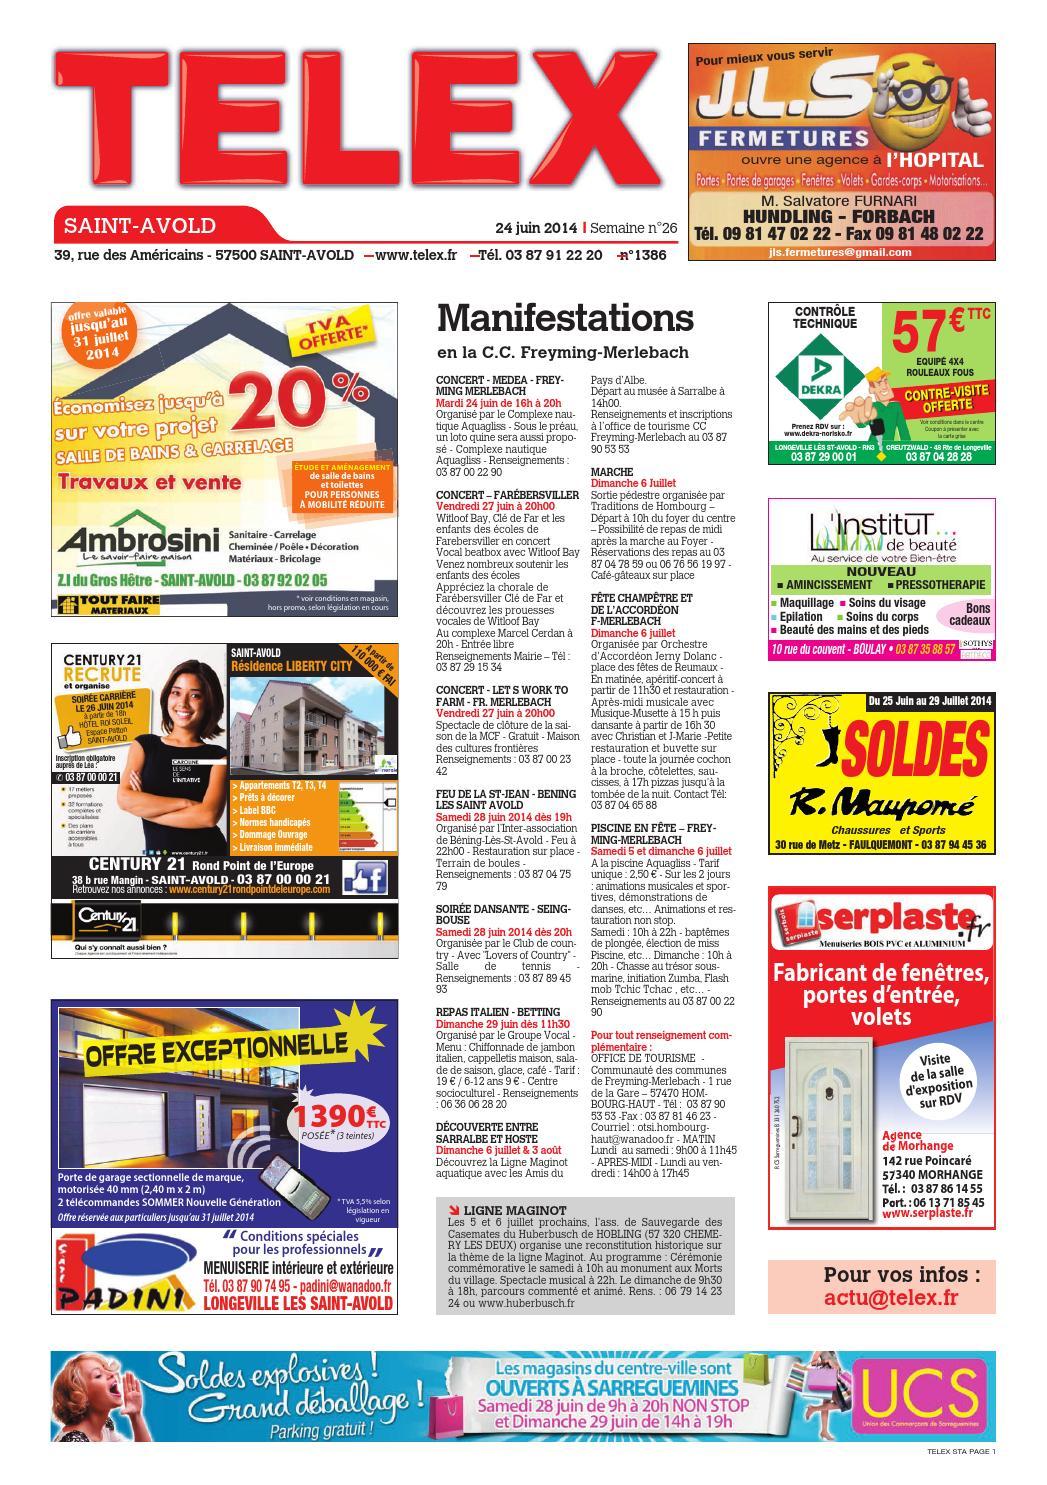 City easy controle technique coupons